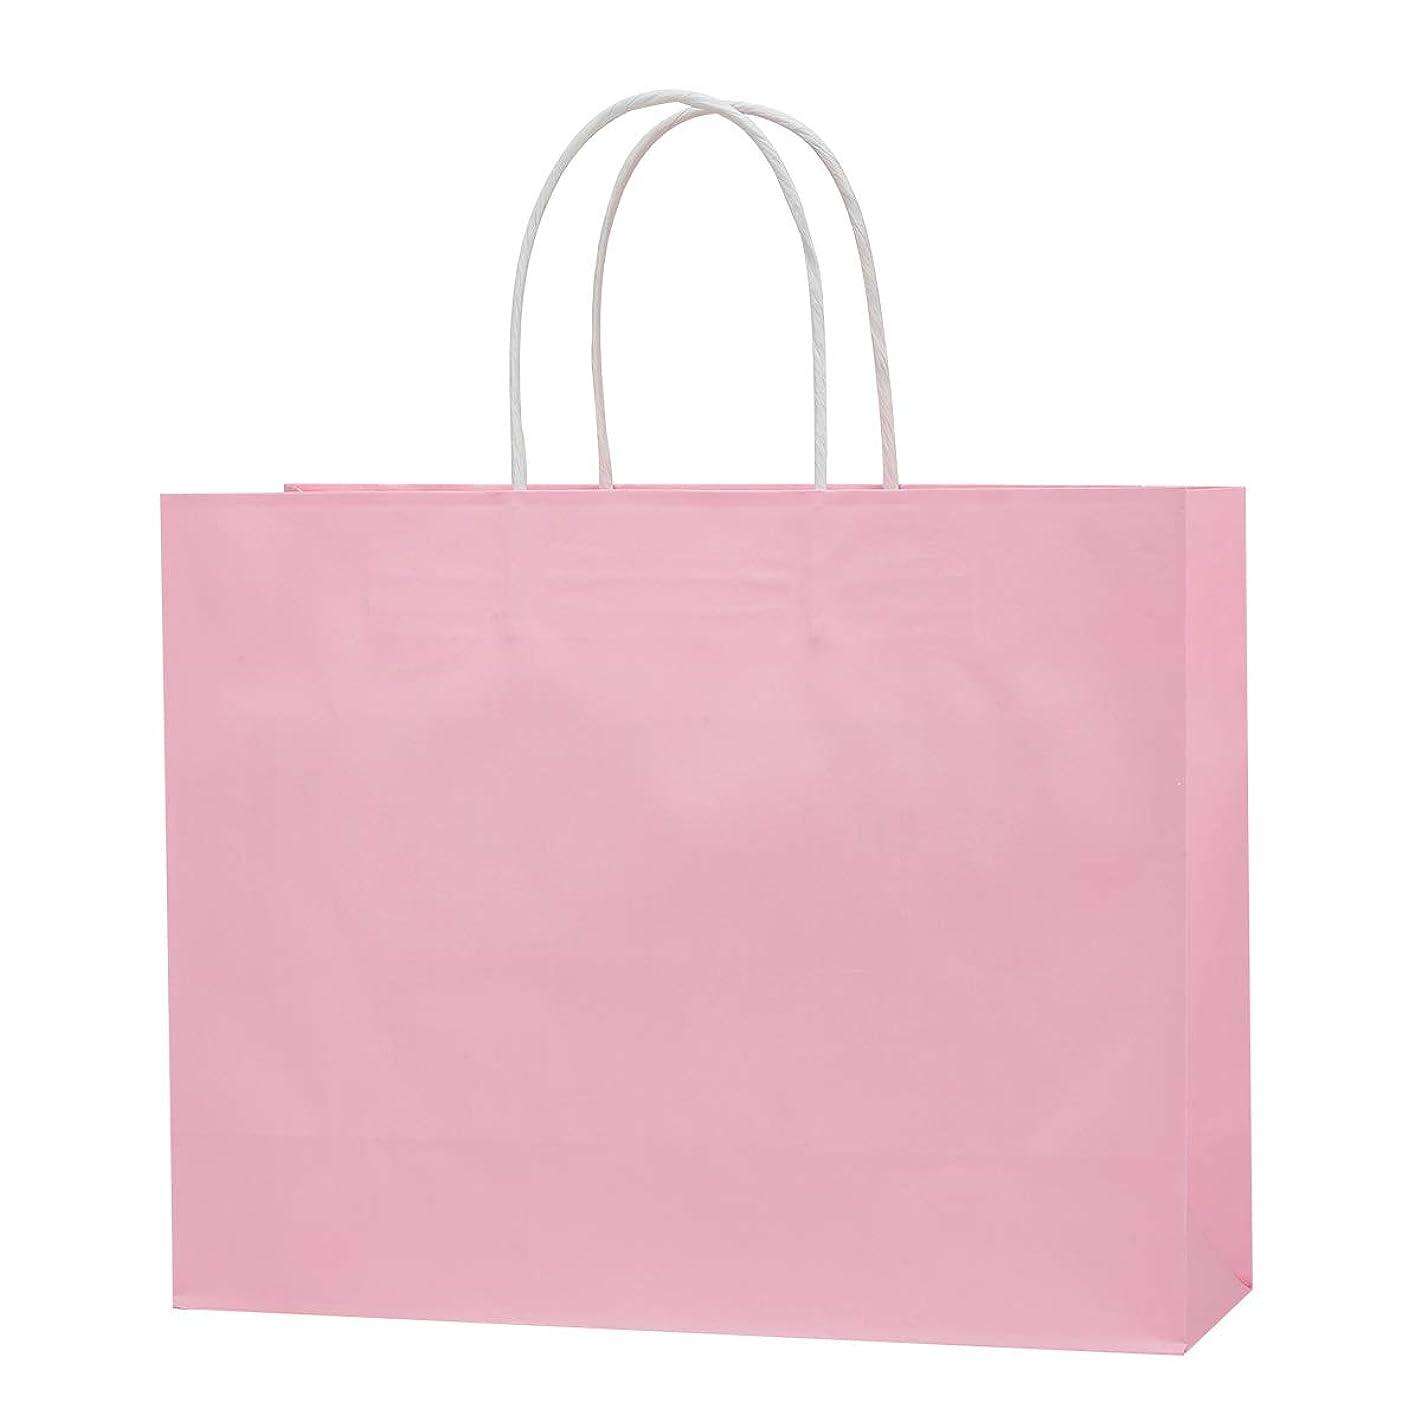 "12.6""x4.3""x9.85"" White Kraft Paper Shopping Bags, Colorful Gift,Party, Wedding, Merchandise, Carry, Retail, Restaurant takeouts,Paper Bags 50pcs/ 100pcs (Light Pink, 50 PCS)"